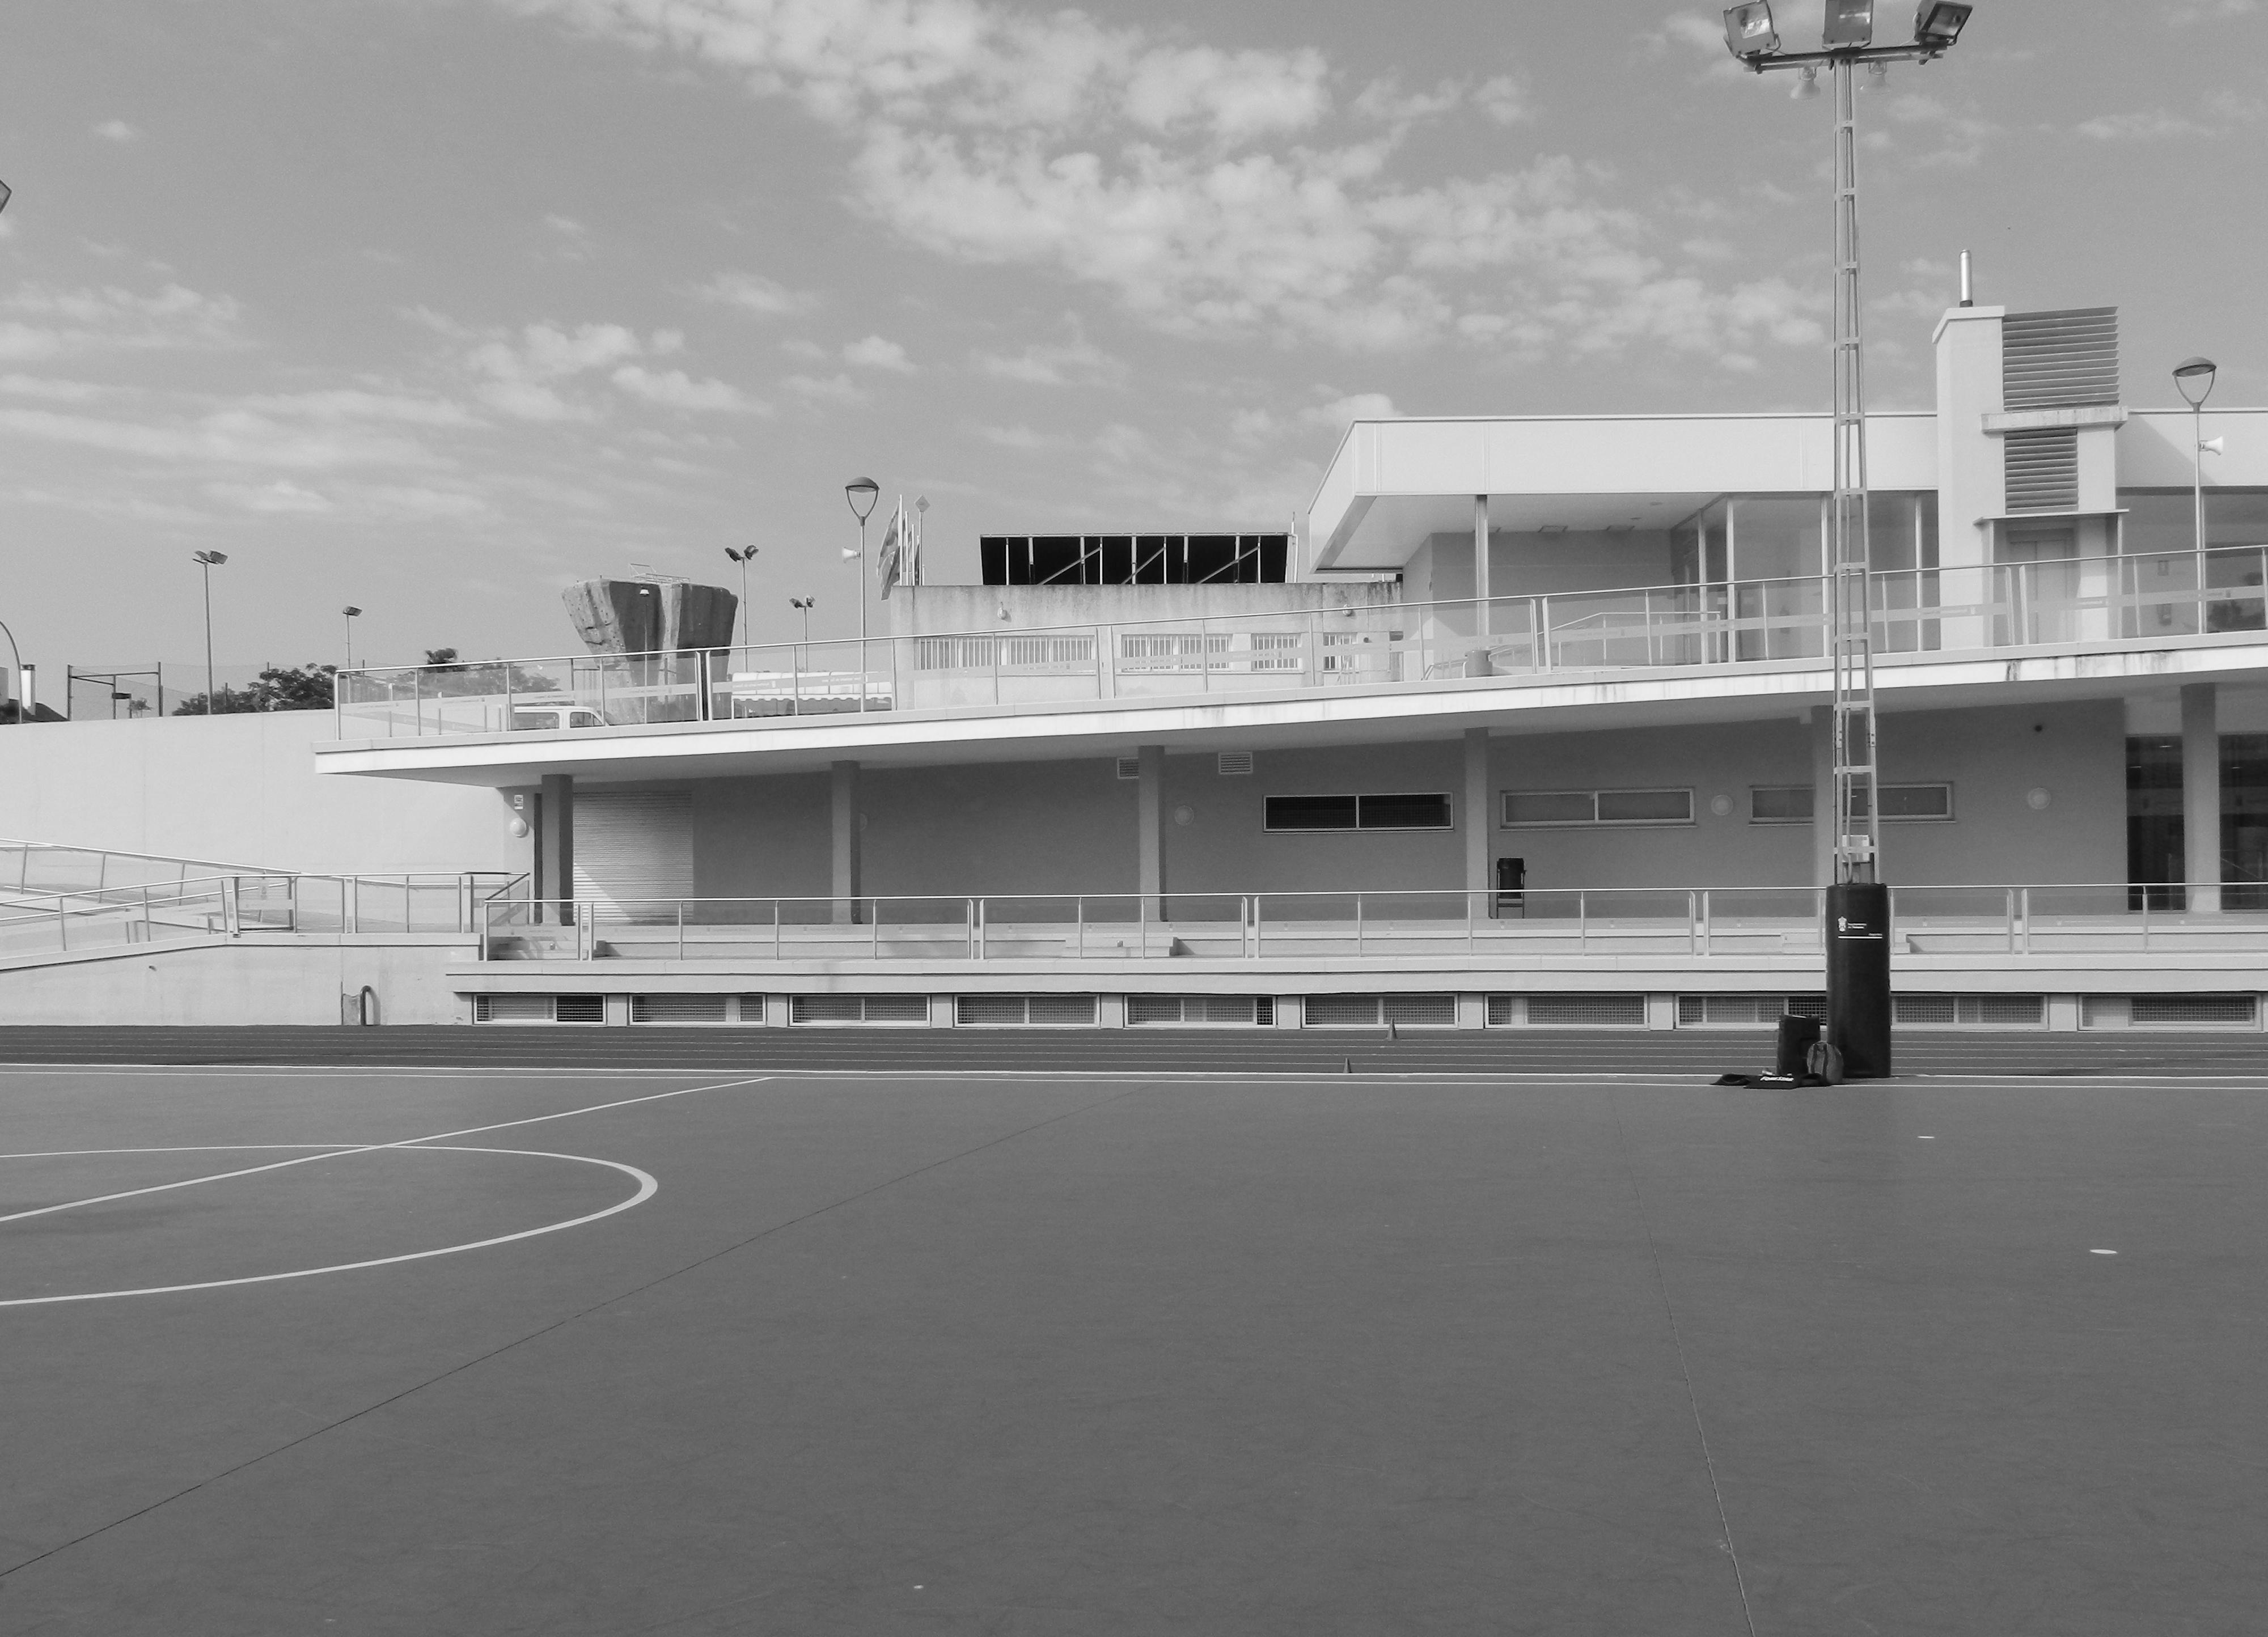 Centro deportivo en tomaresbm2 architecture engineering for Piscina cubierta tomares